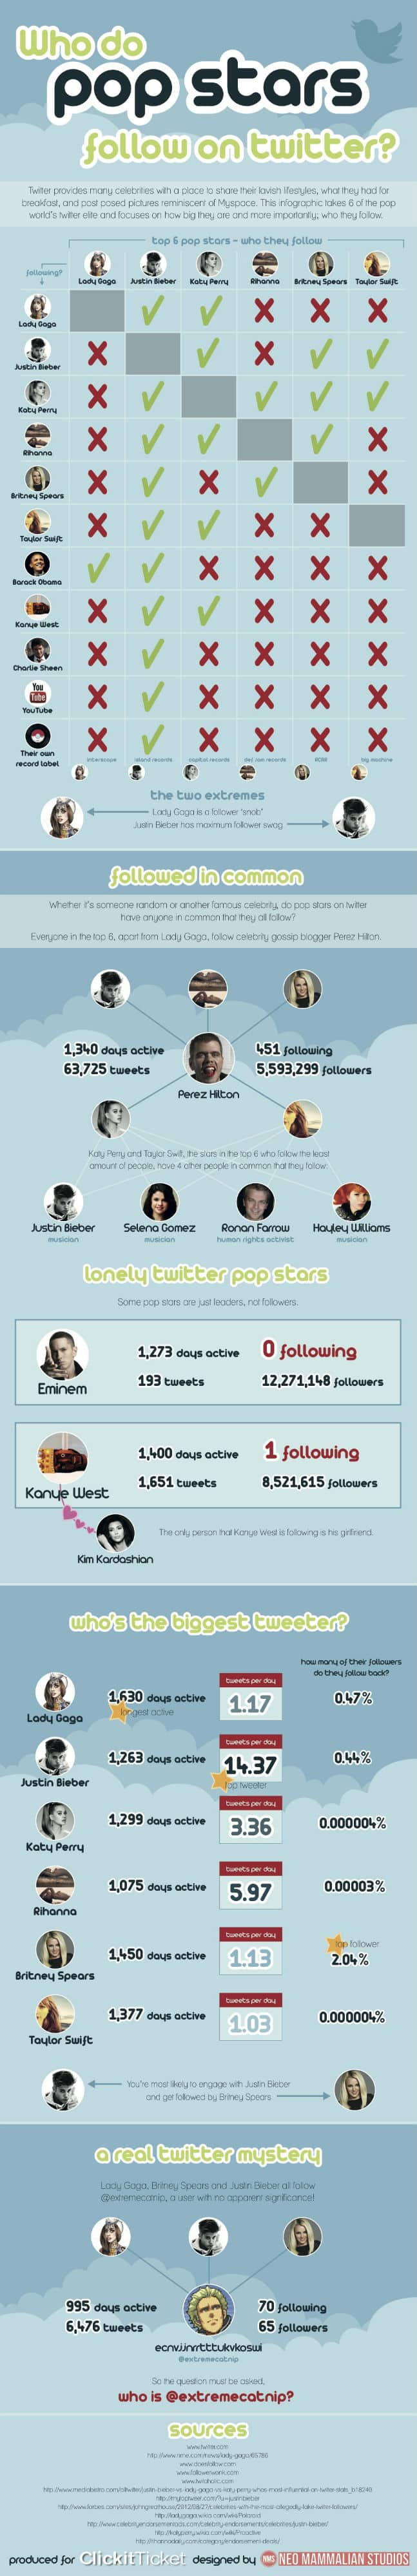 Twitter Pop Stars Follow Chart